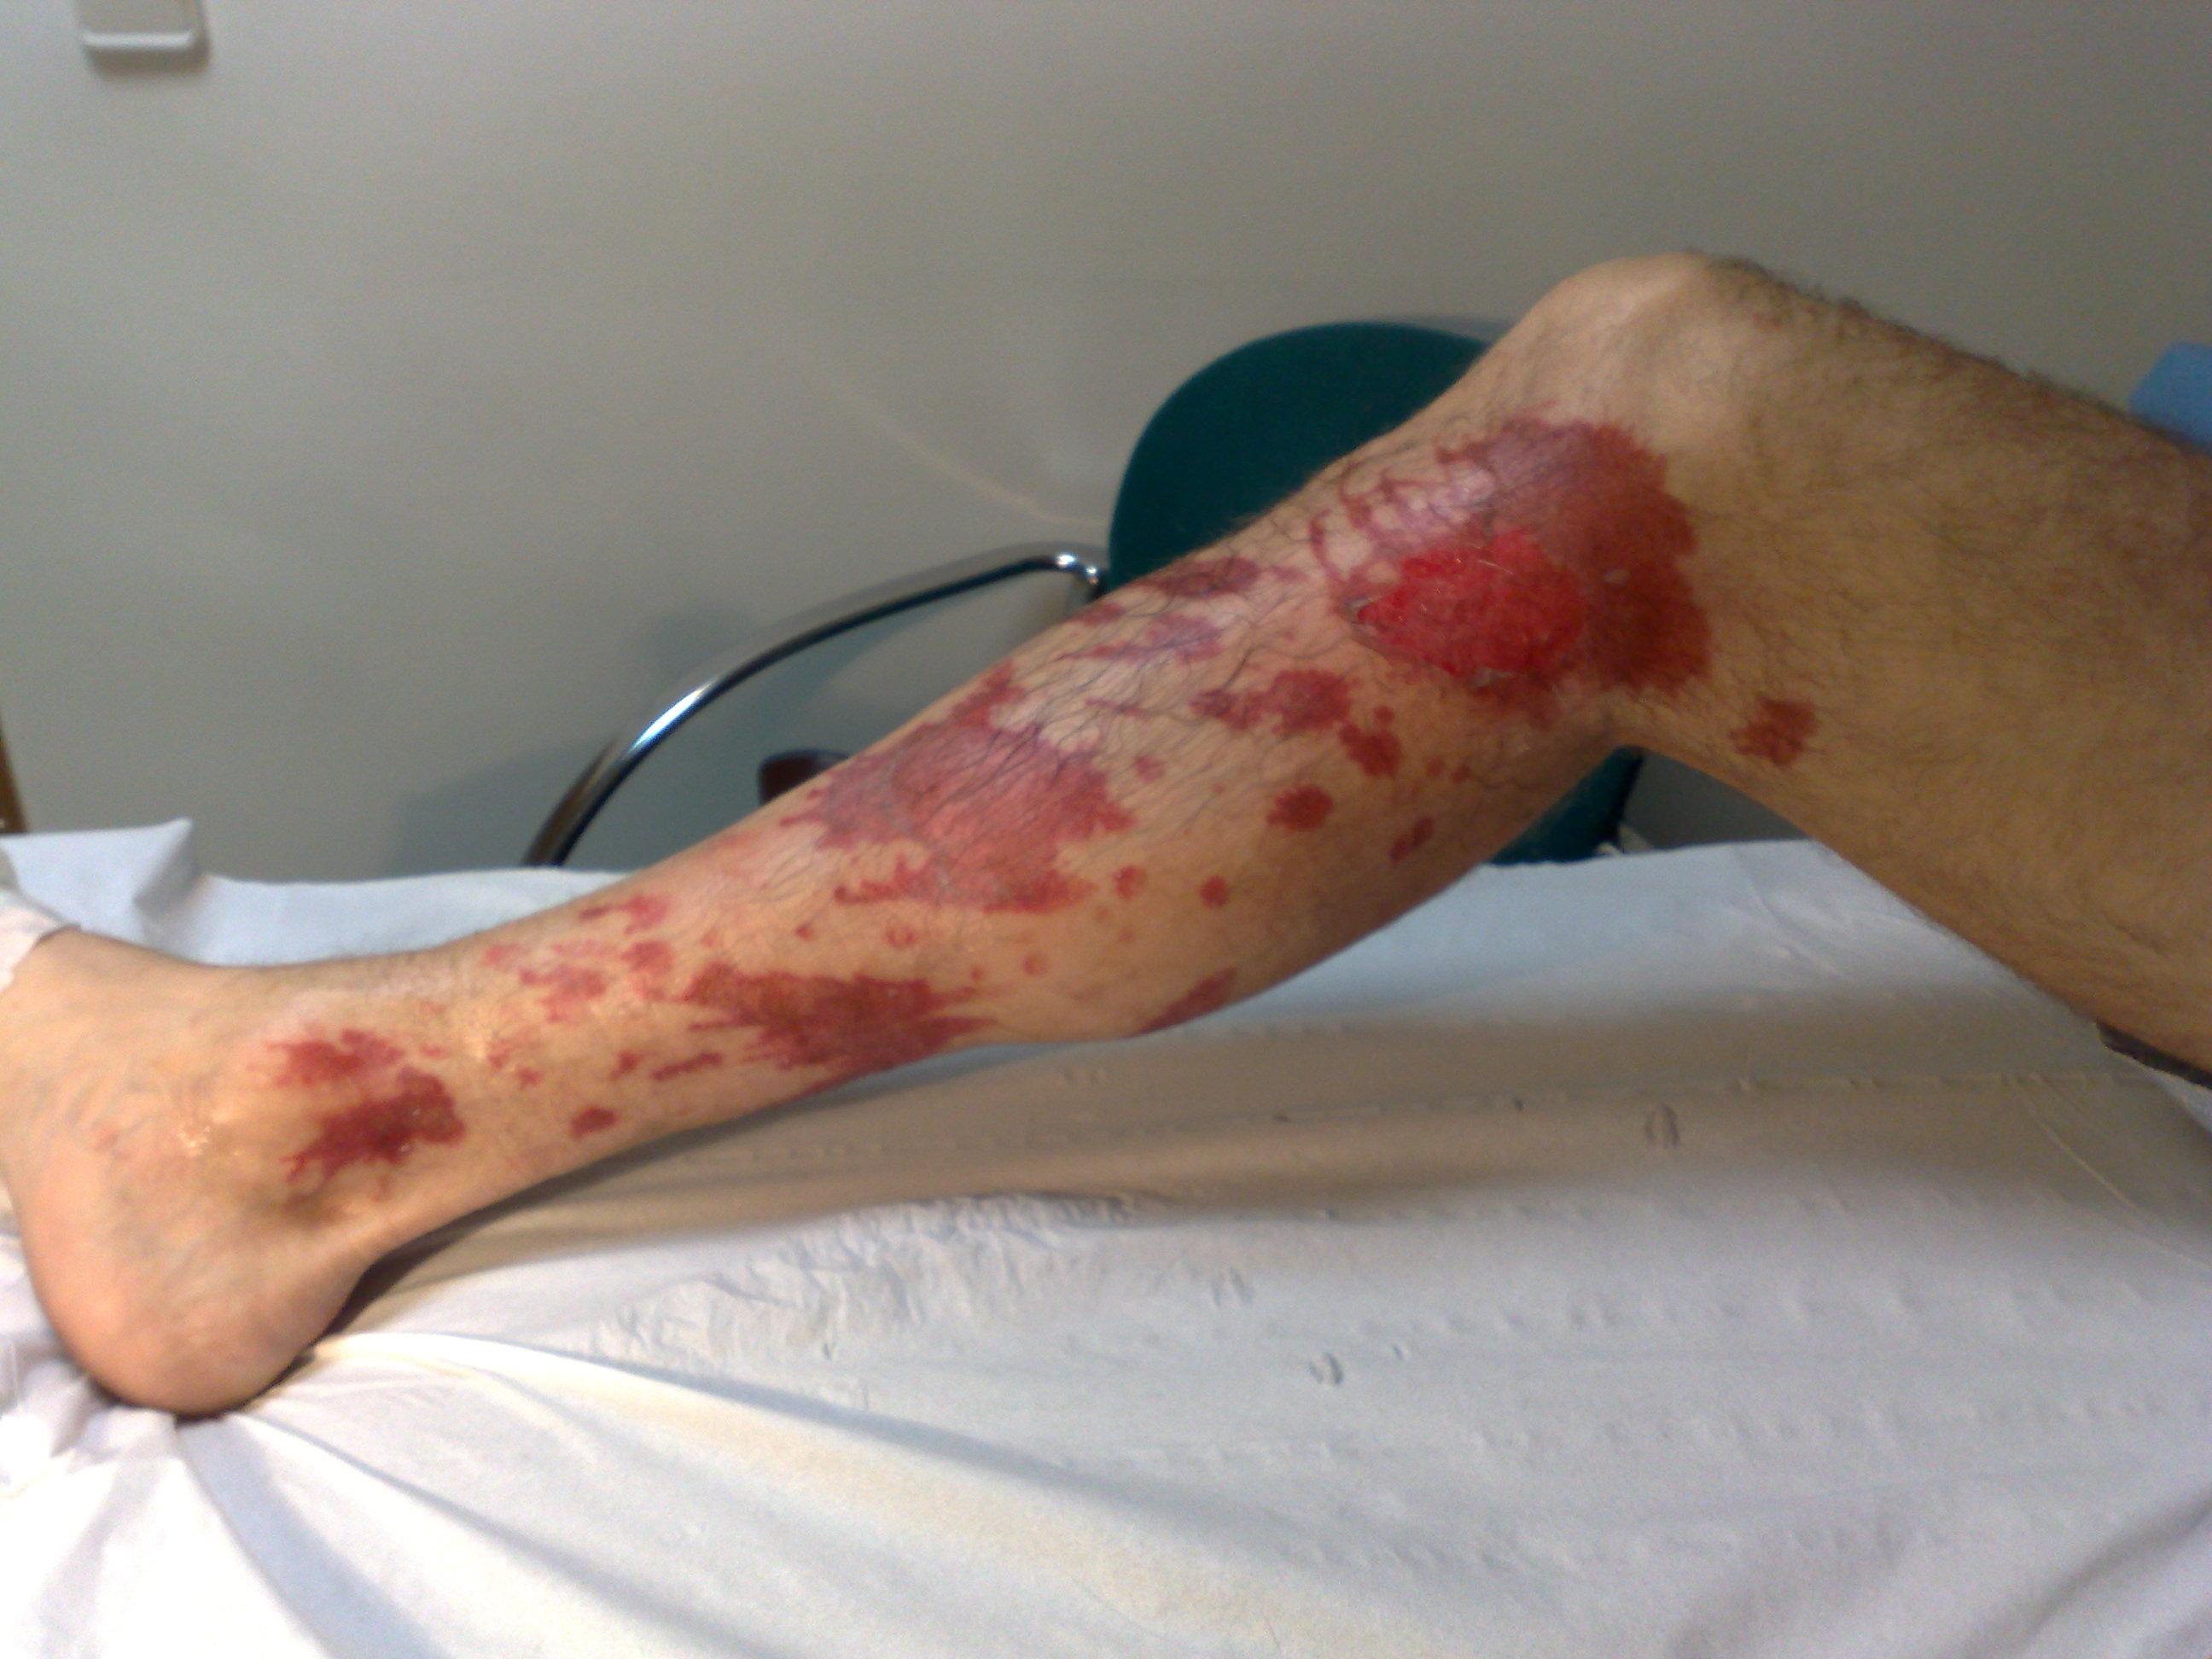 La foto de la psoriasis a los lactantes